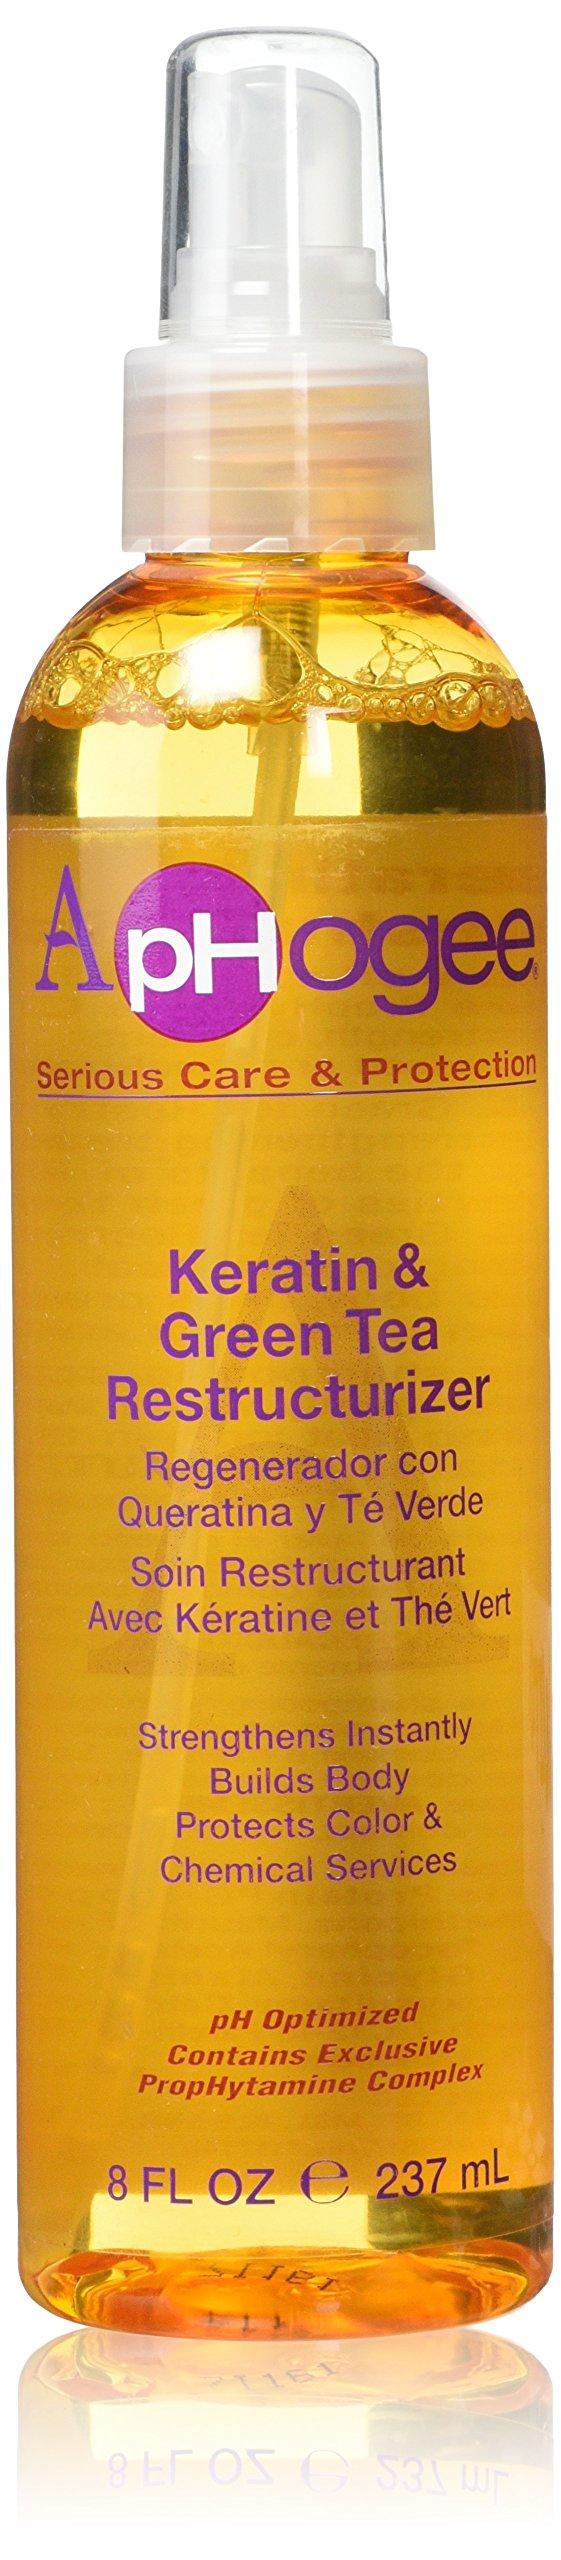 Aphogee Keratin and Green Tea Restructurizer, 8 Fl Oz